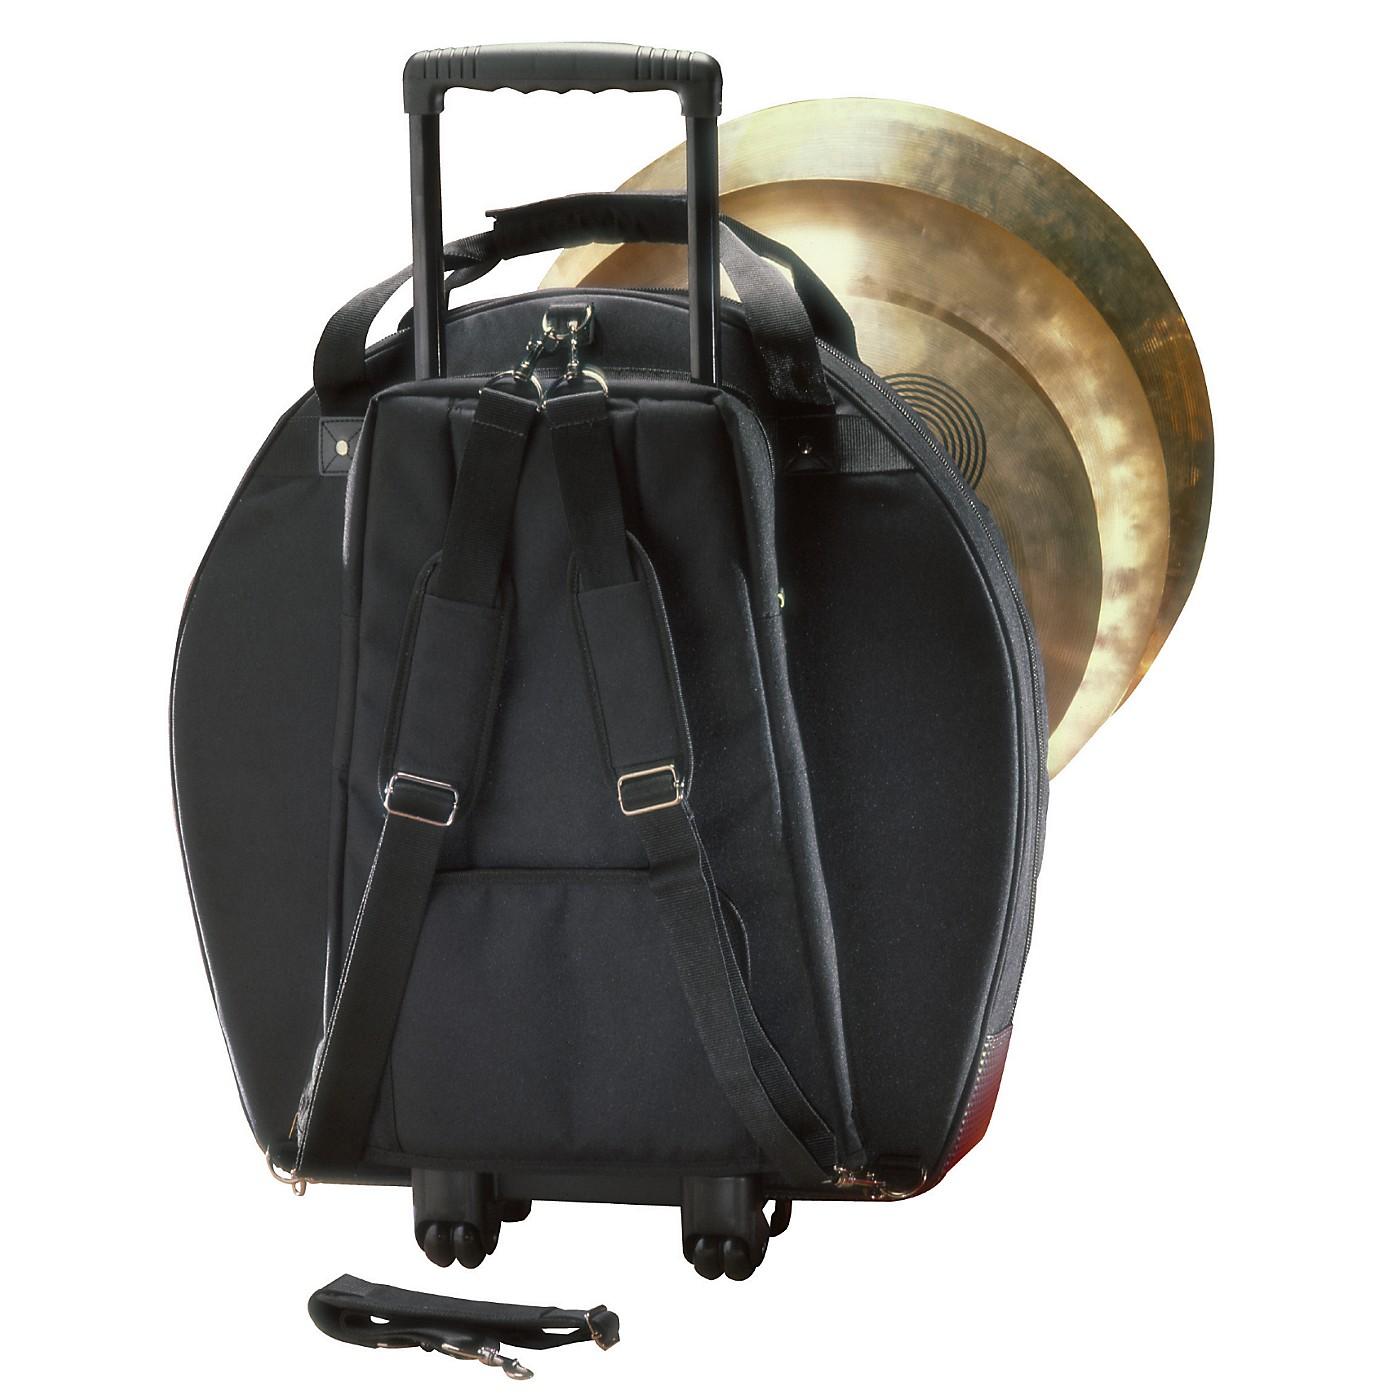 Humes & Berg Galaxy Tilt-N-Pull Cymbal Bag with Padded Dividers thumbnail